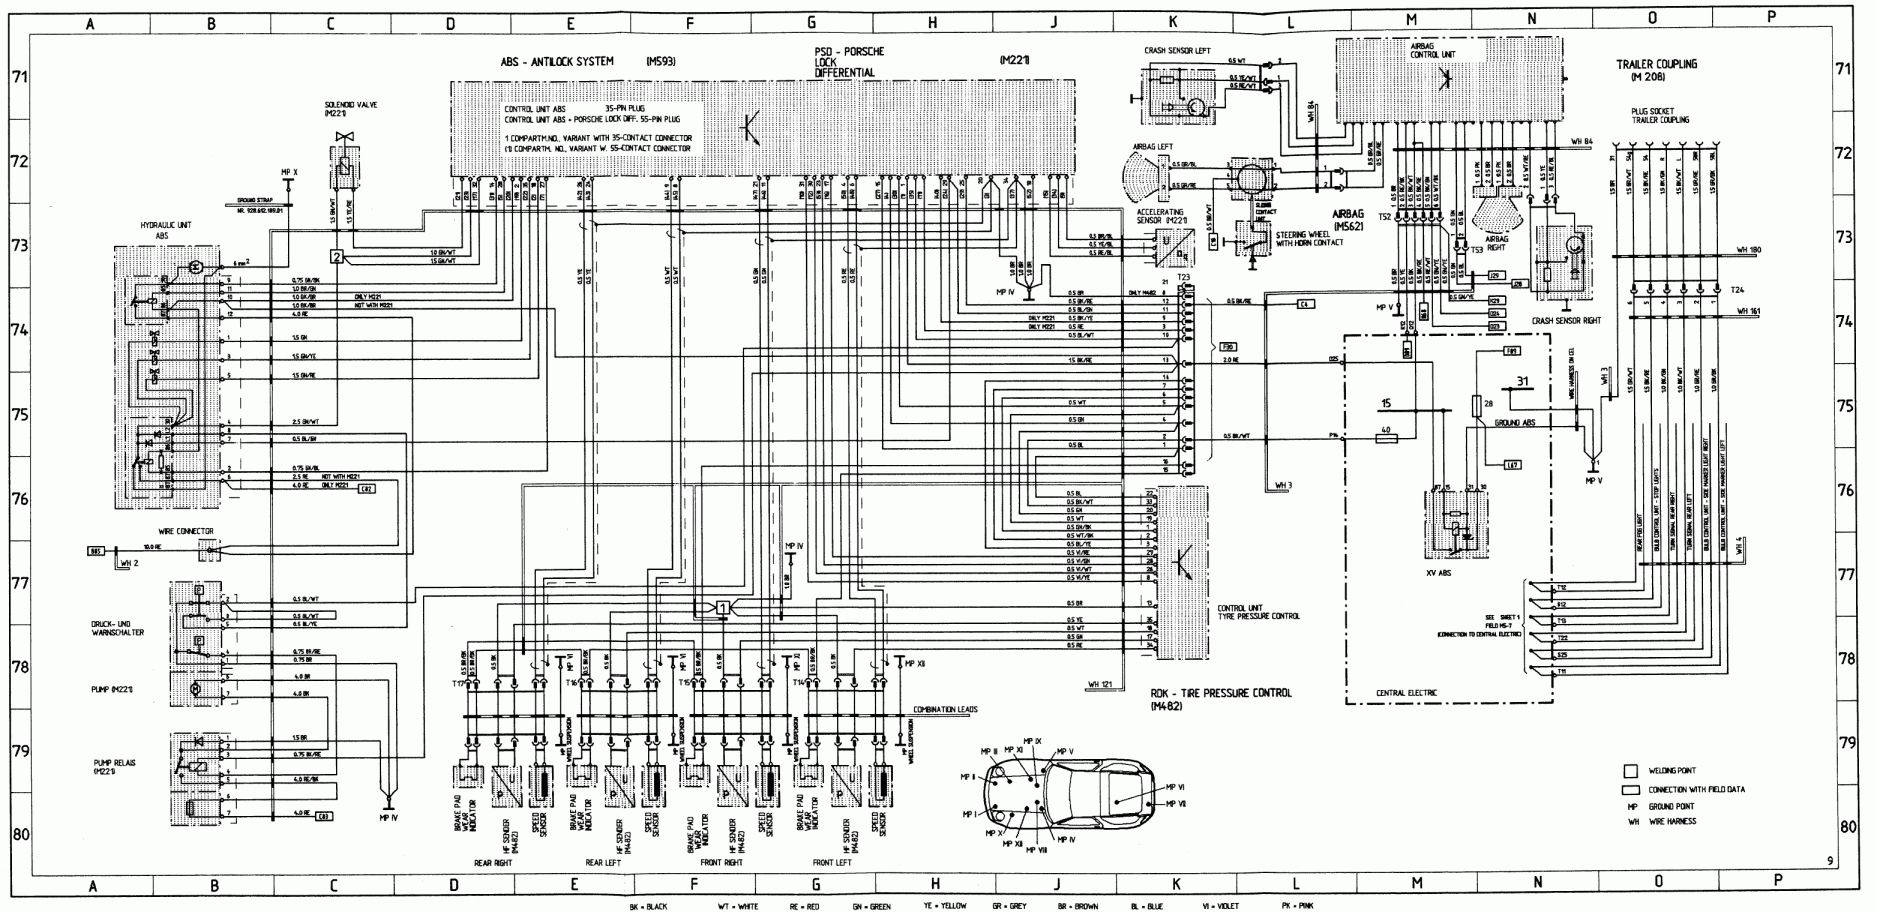 10 N52 Engine Wiring Diagram Engine Diagram Wiringg Net Electrical Wiring Diagram Bmw E46 Electrical Wiring